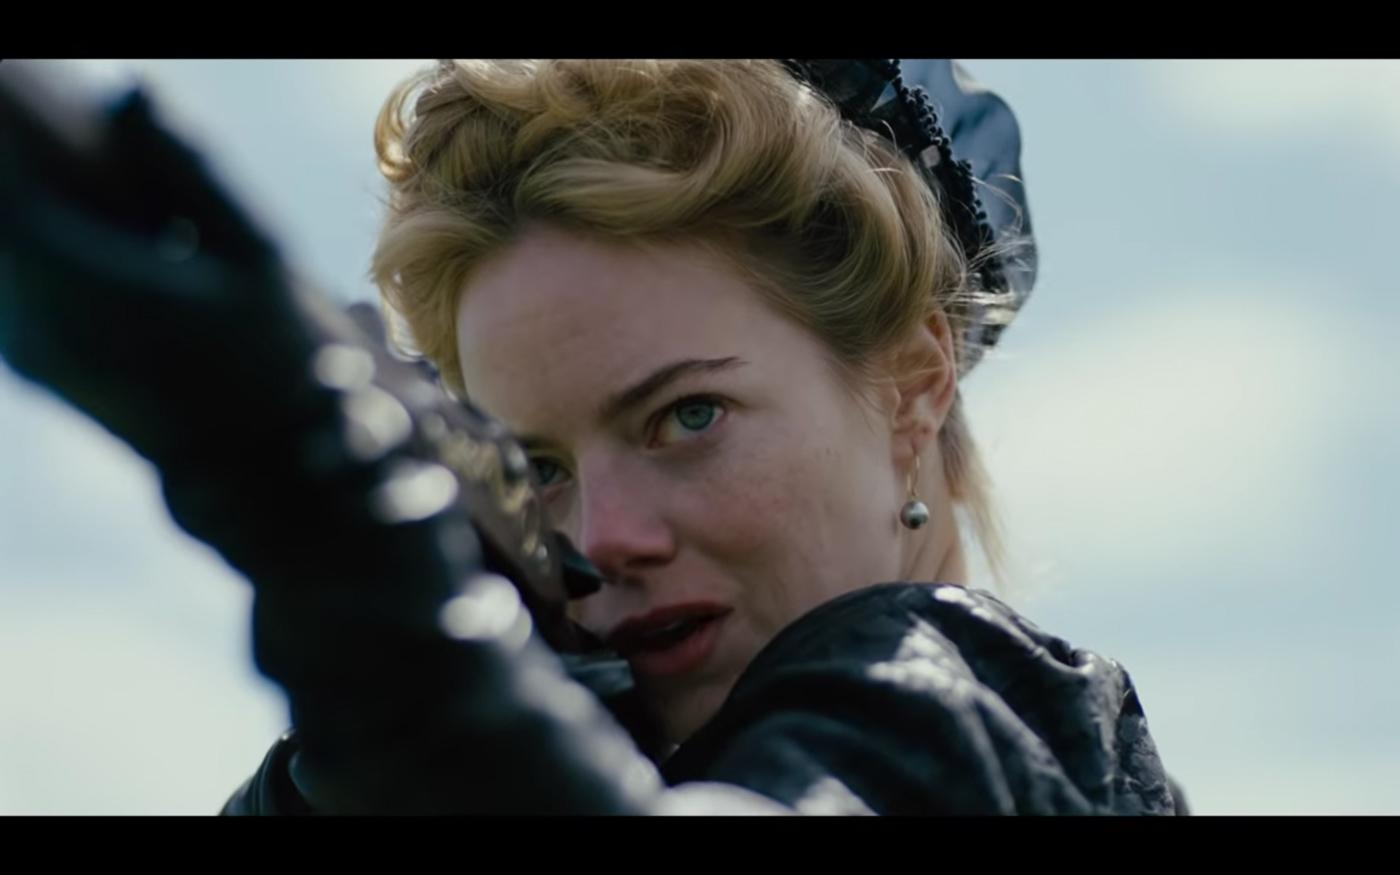 Still from the movie trailer